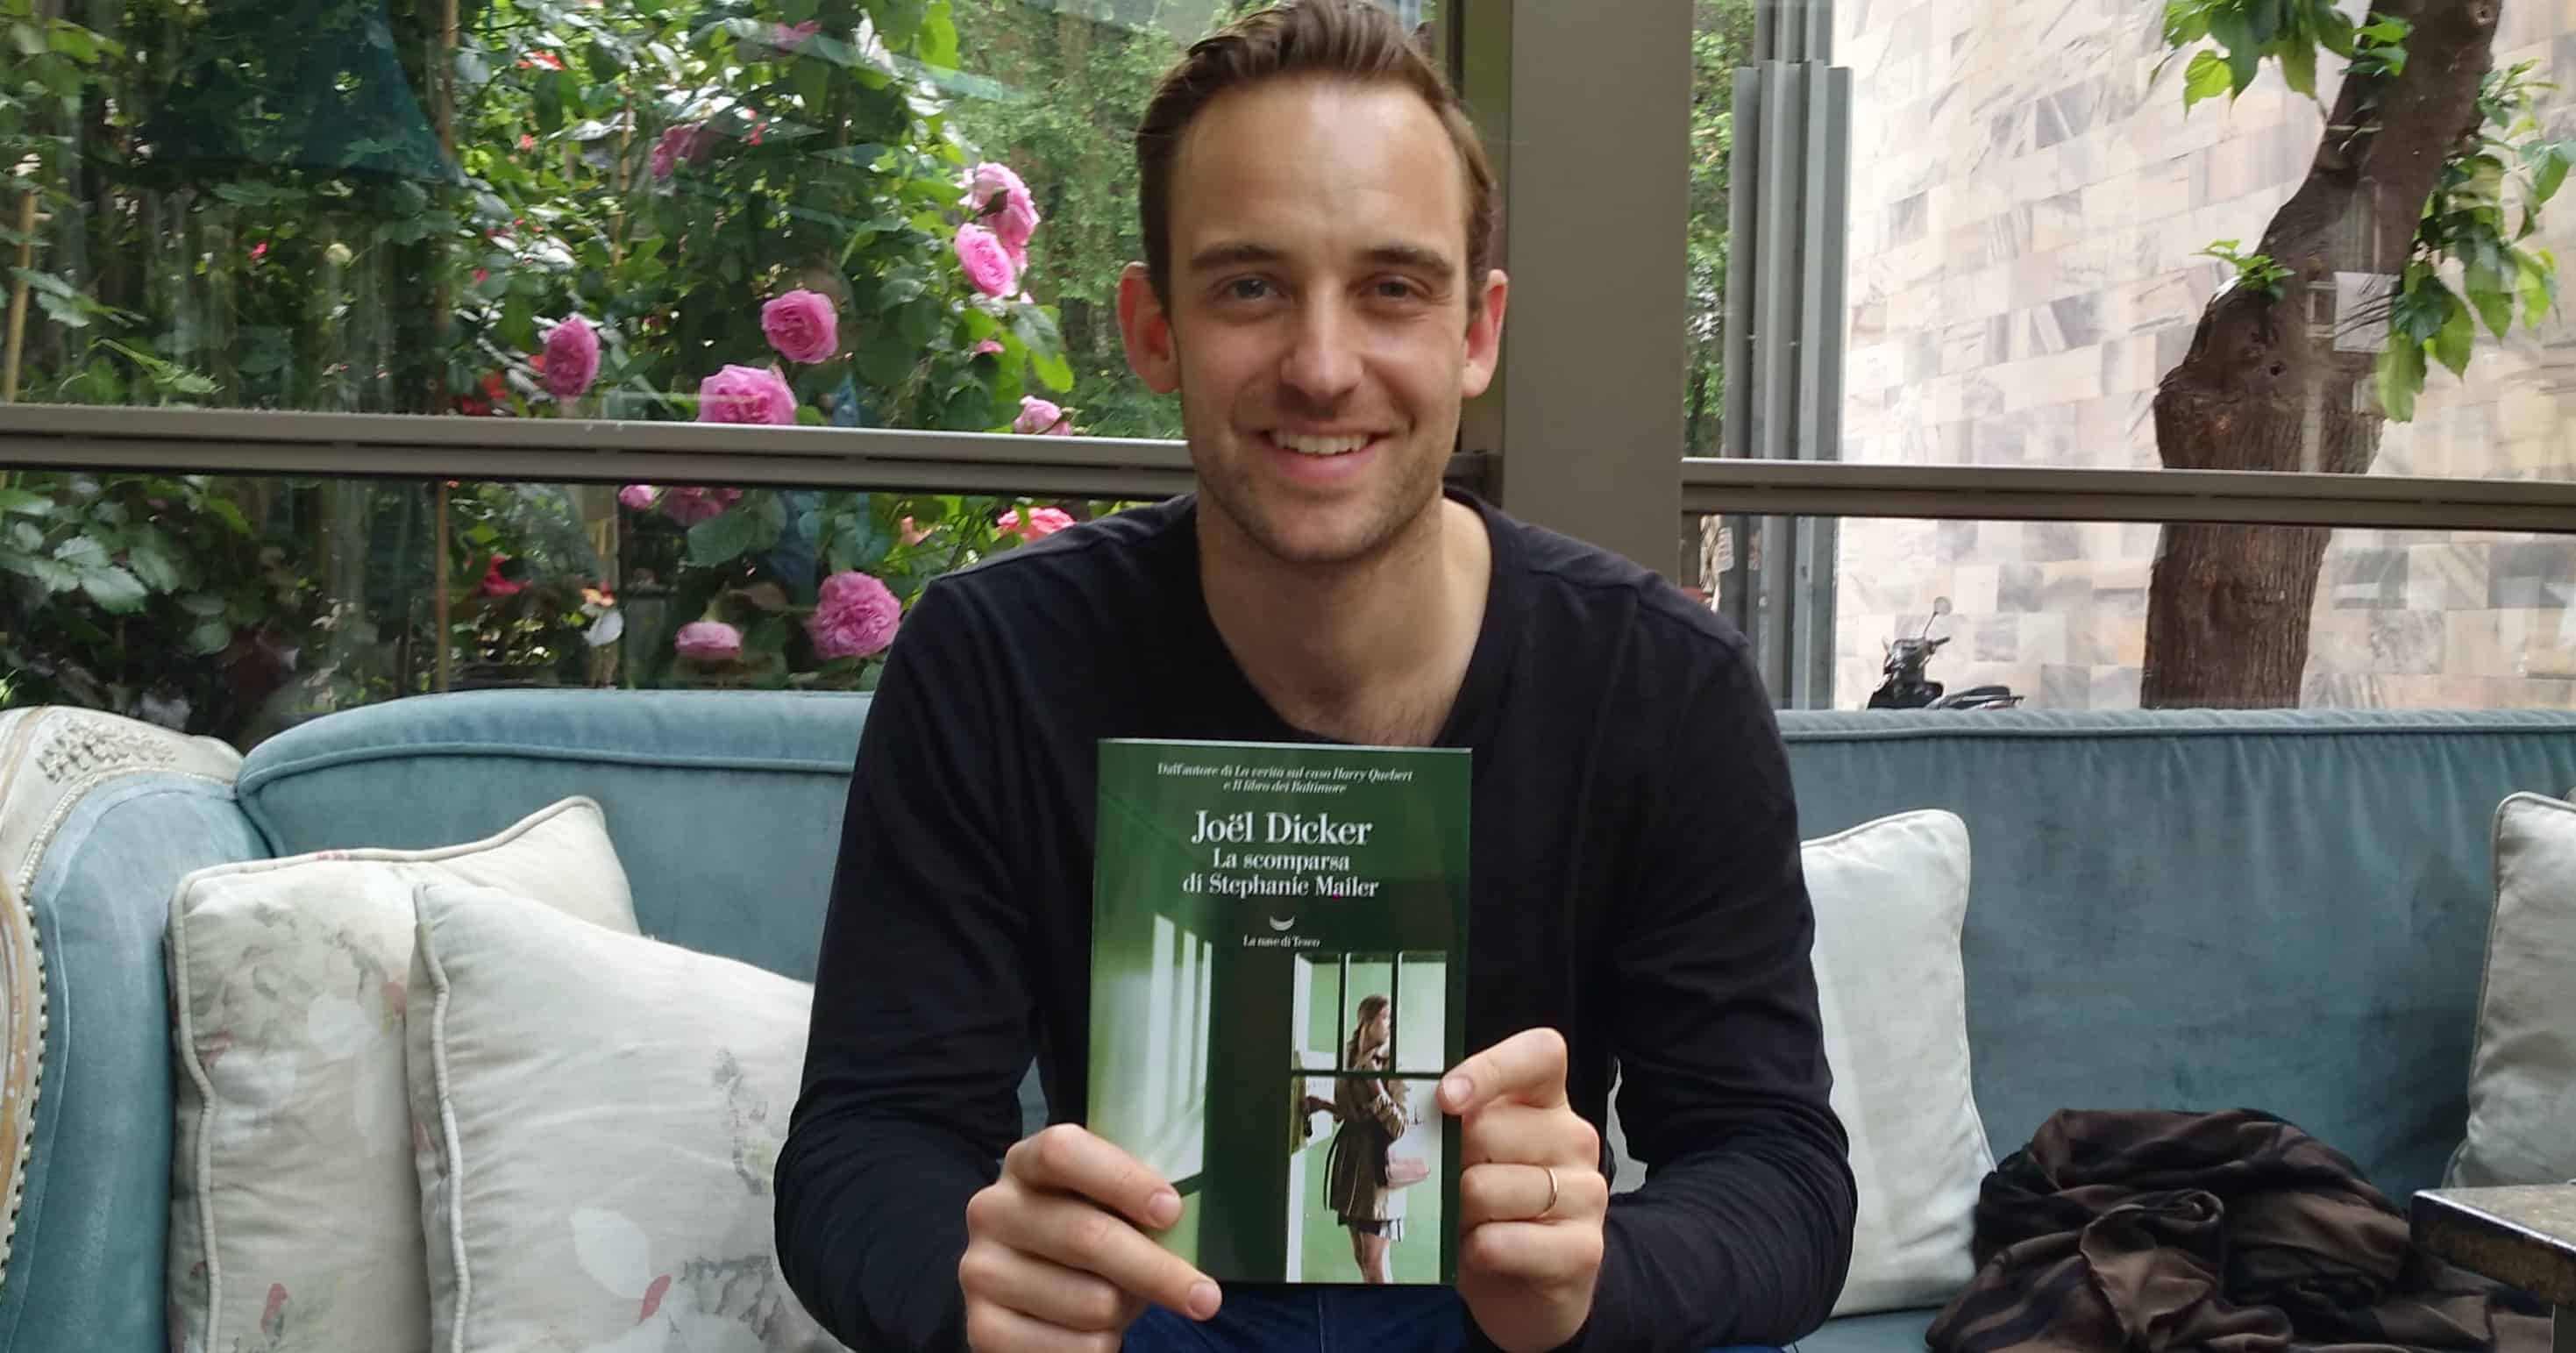 PDE intervista Joël Dicker, autore di La scomparsa di Stephanie Mailer, La nave di Teseo (2018)